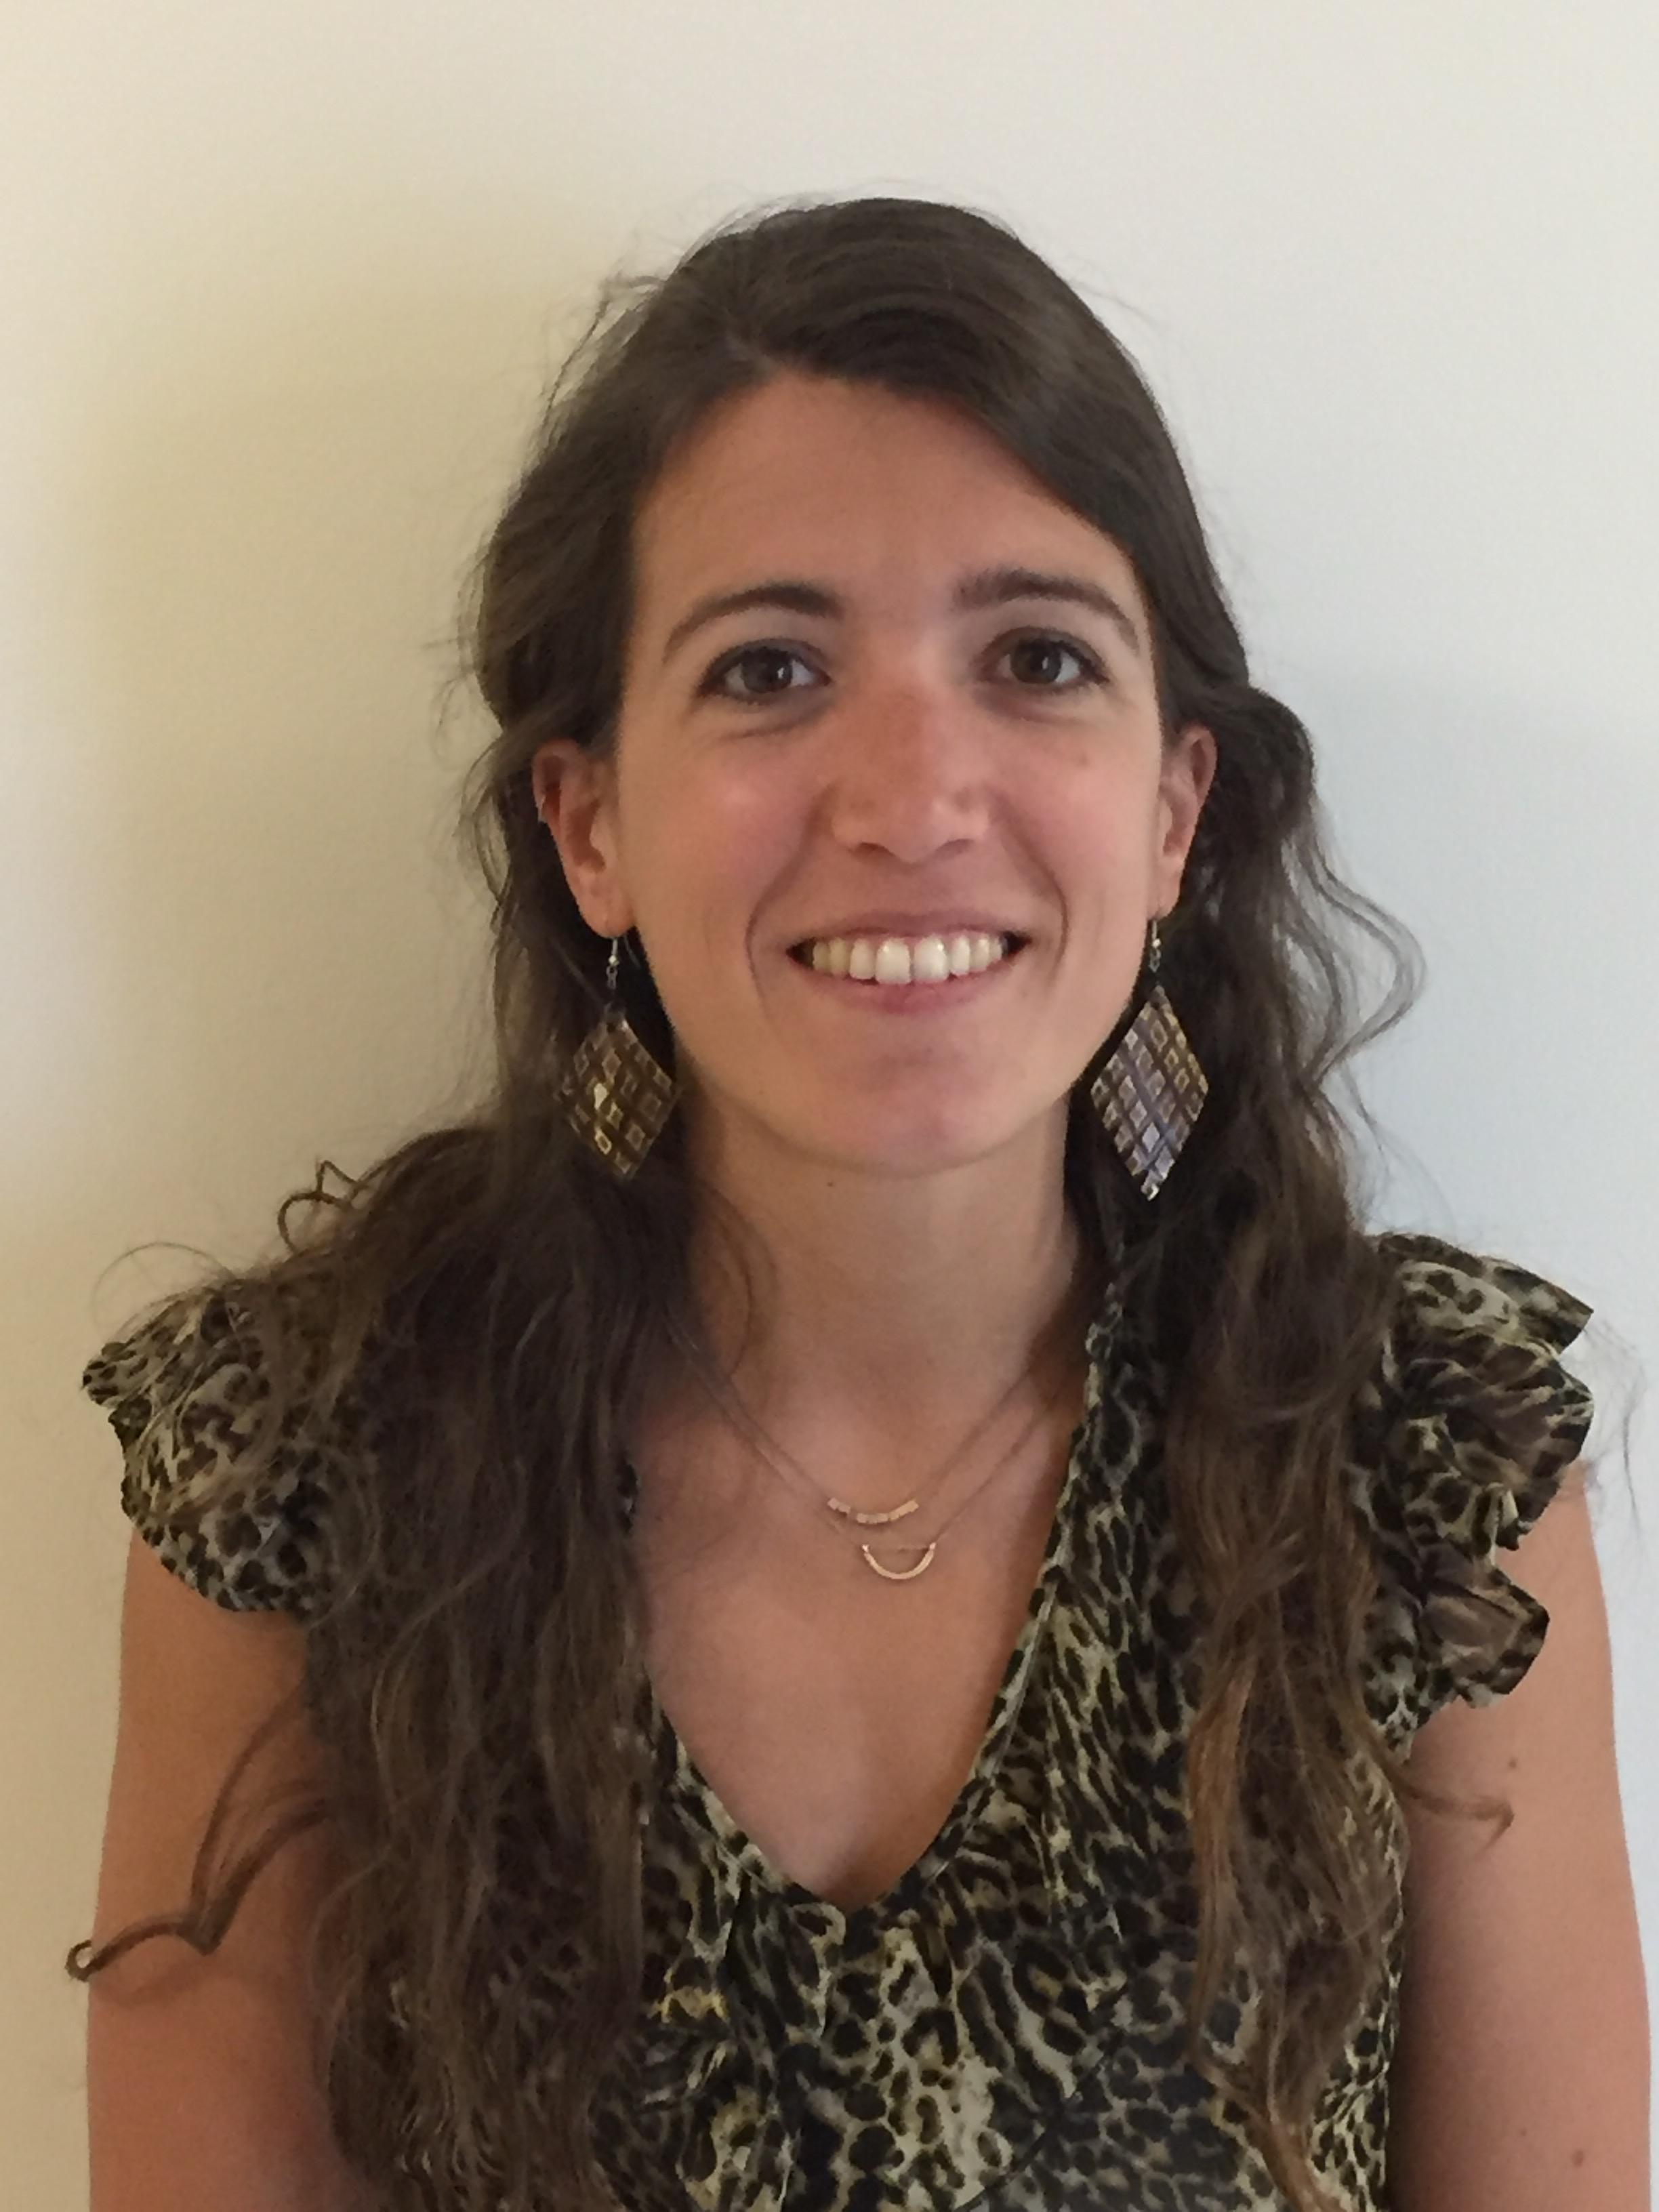 "<a href=""https://www.linkedin.com/in/estercaffarel/ ""target=""_blank"">Ester Caffarel-Salvador →</a><strong></strong><strong>MIT - Langer Lab</strong>"